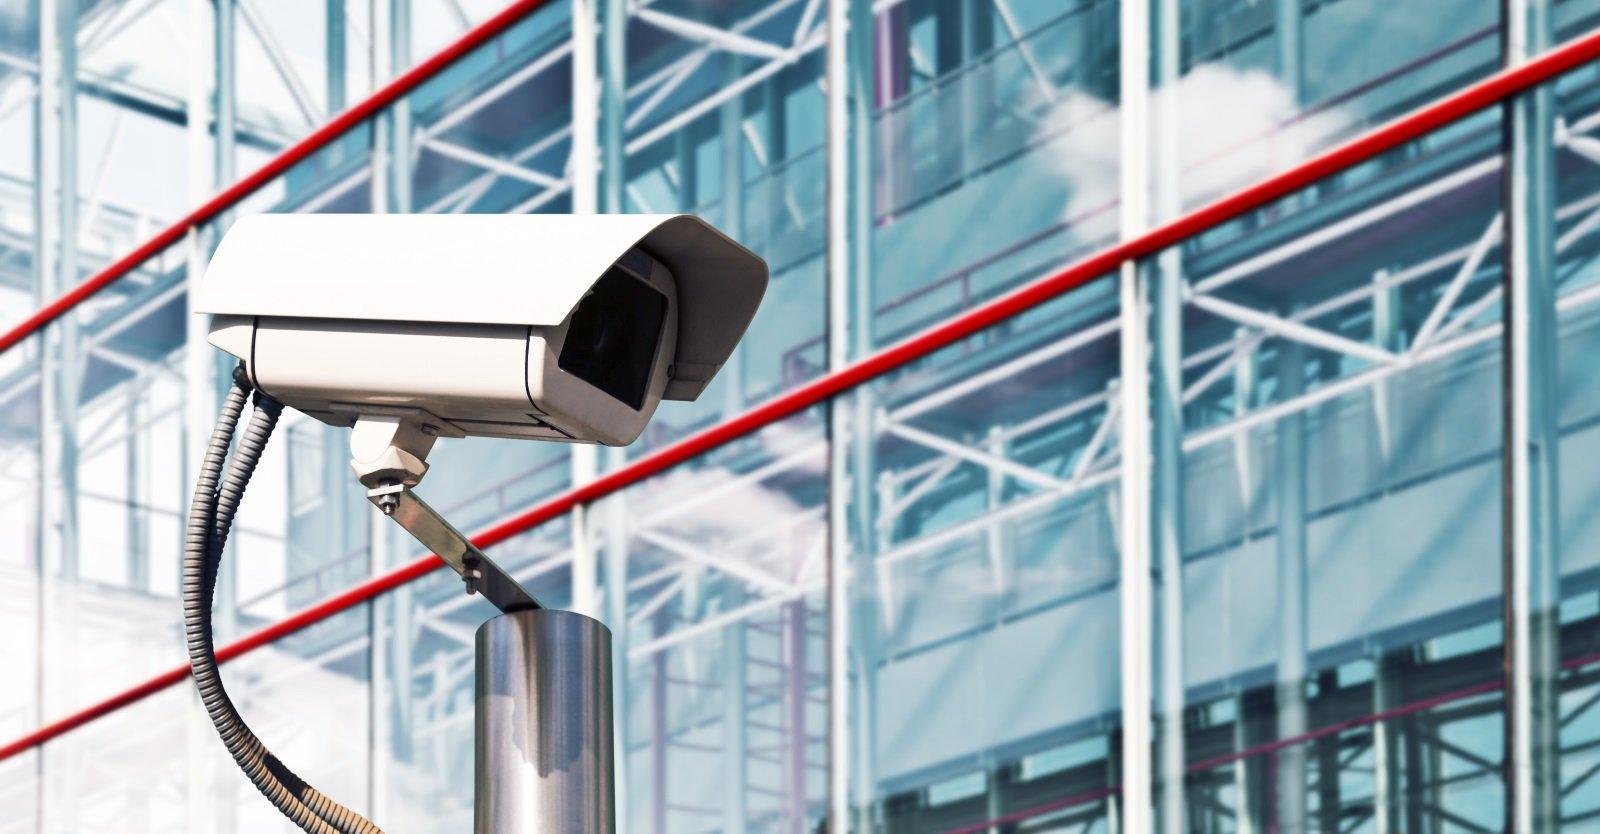 Camera de videosorveglianza esterna